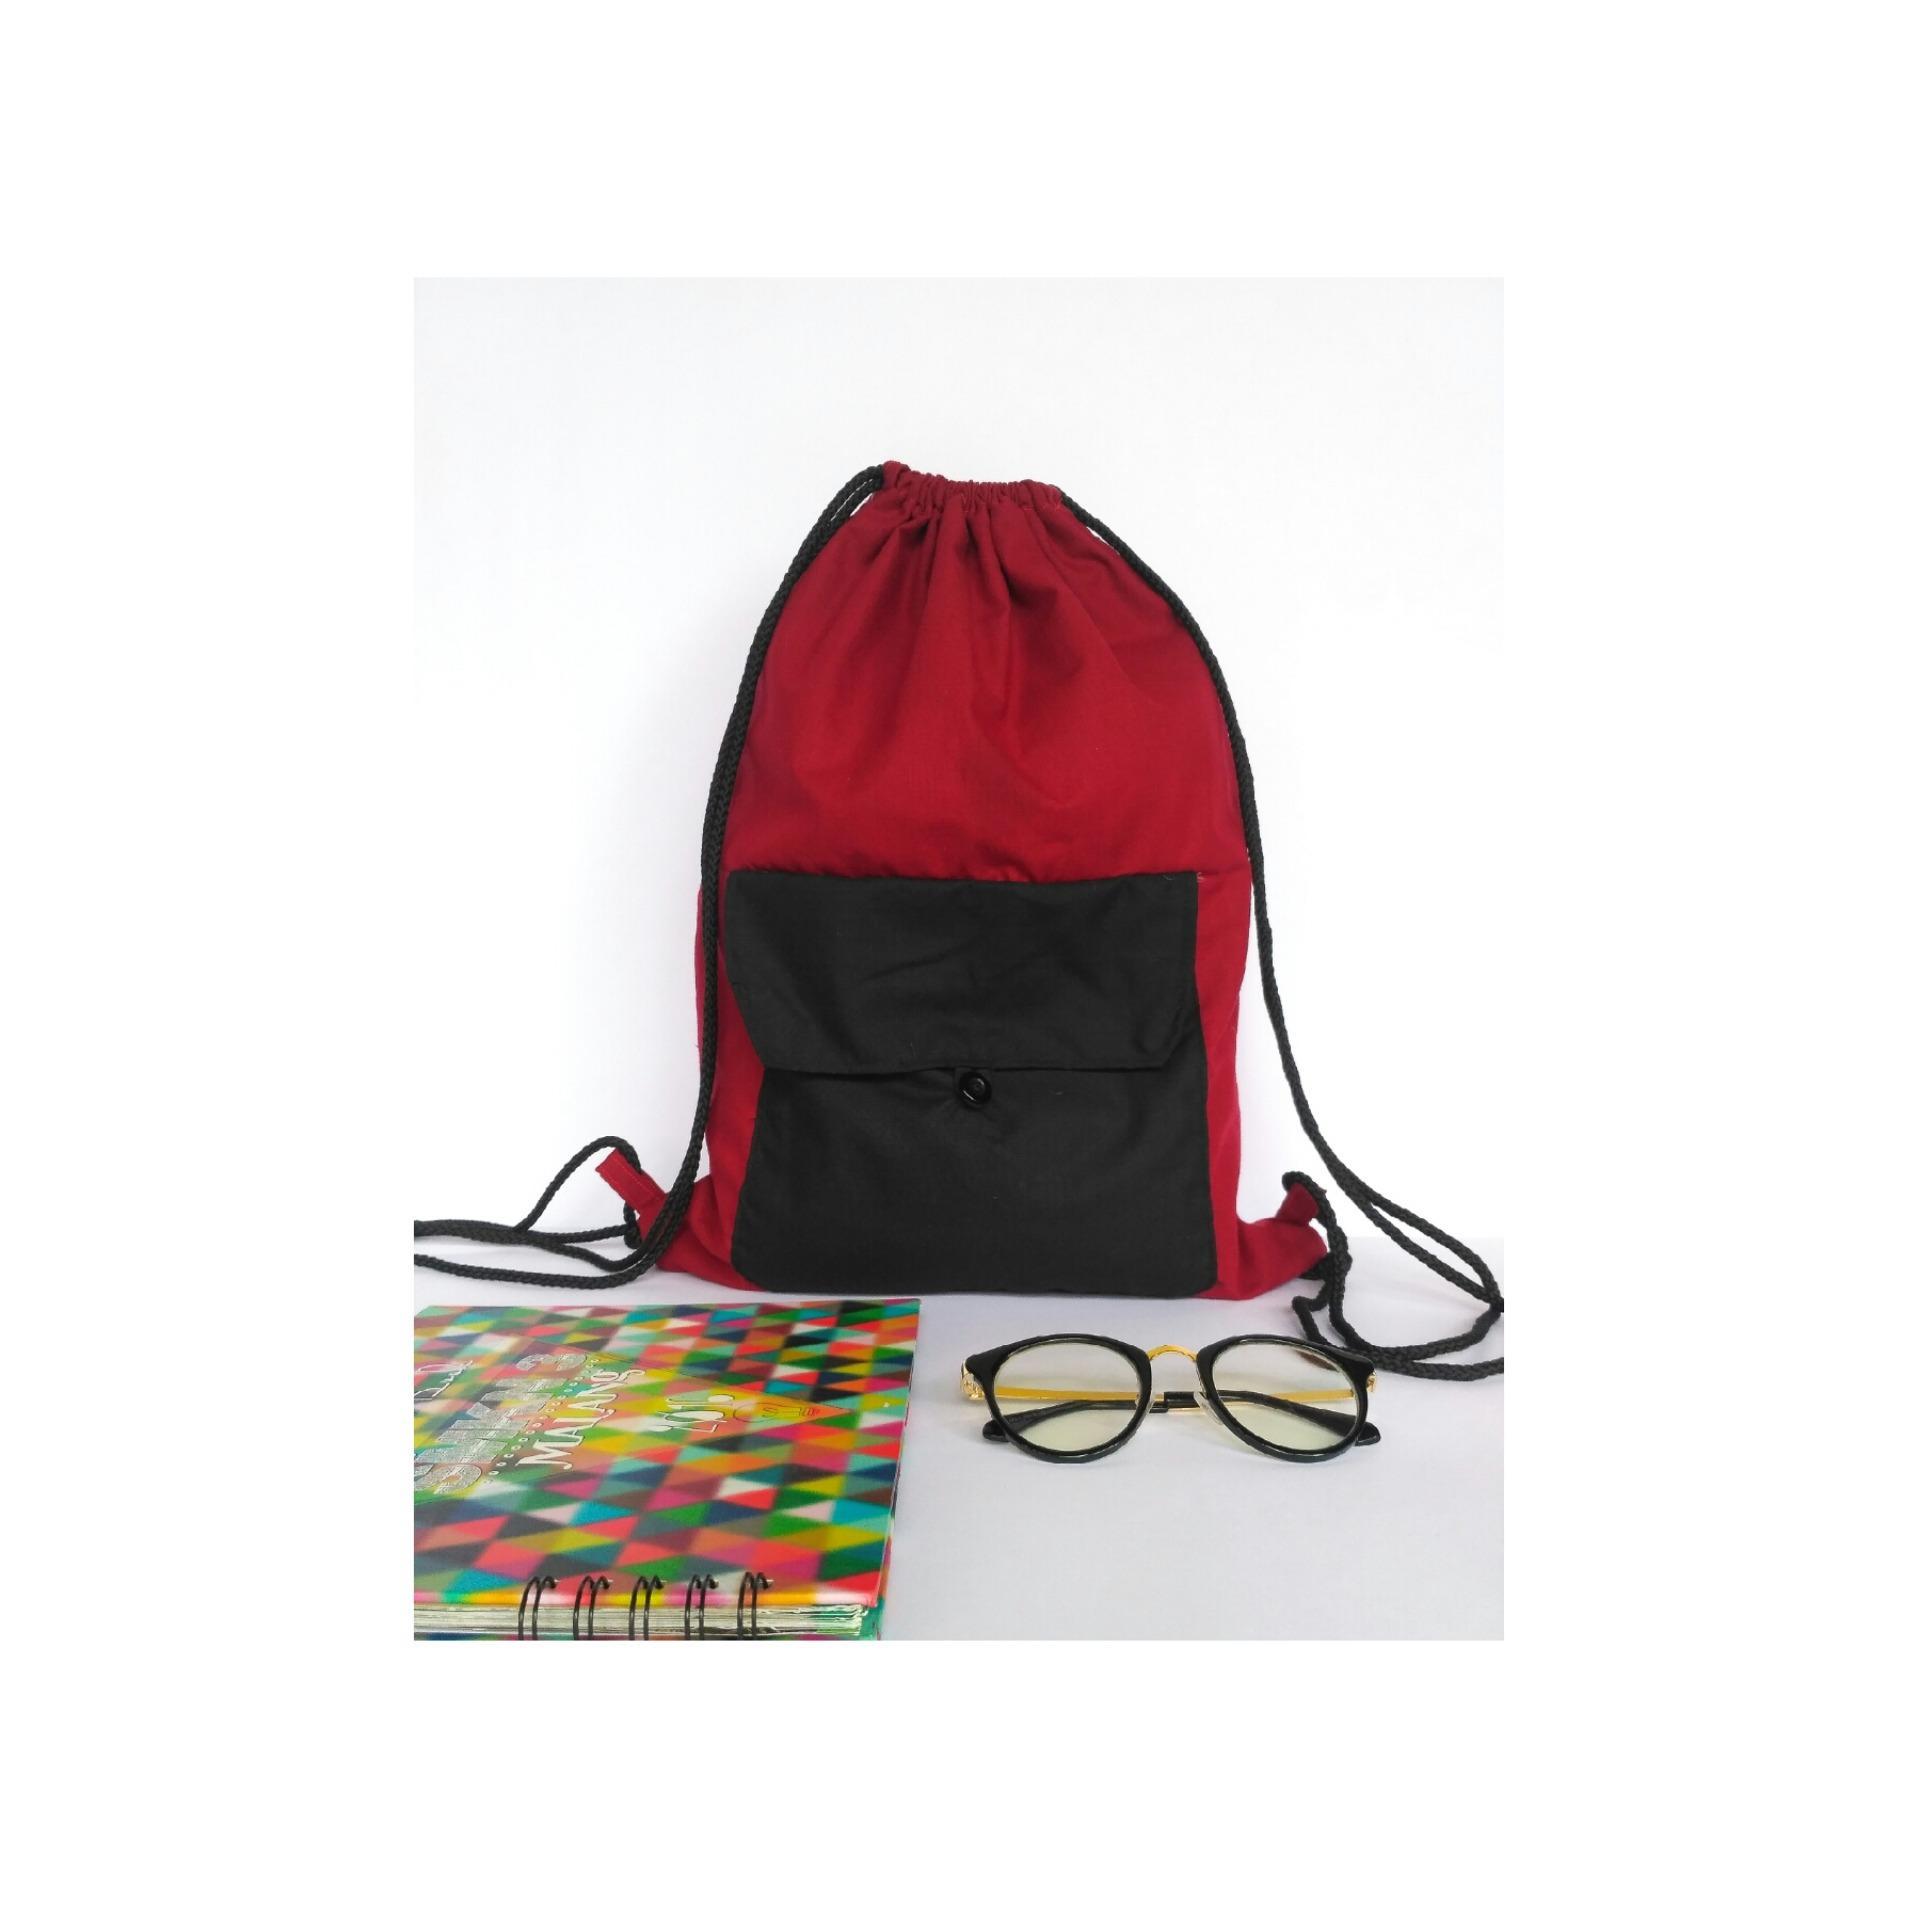 Tas serut / String bag / Backpack / Sling bag / Tas futsal / Tas sekolah / Sport bag / Tas Punggung